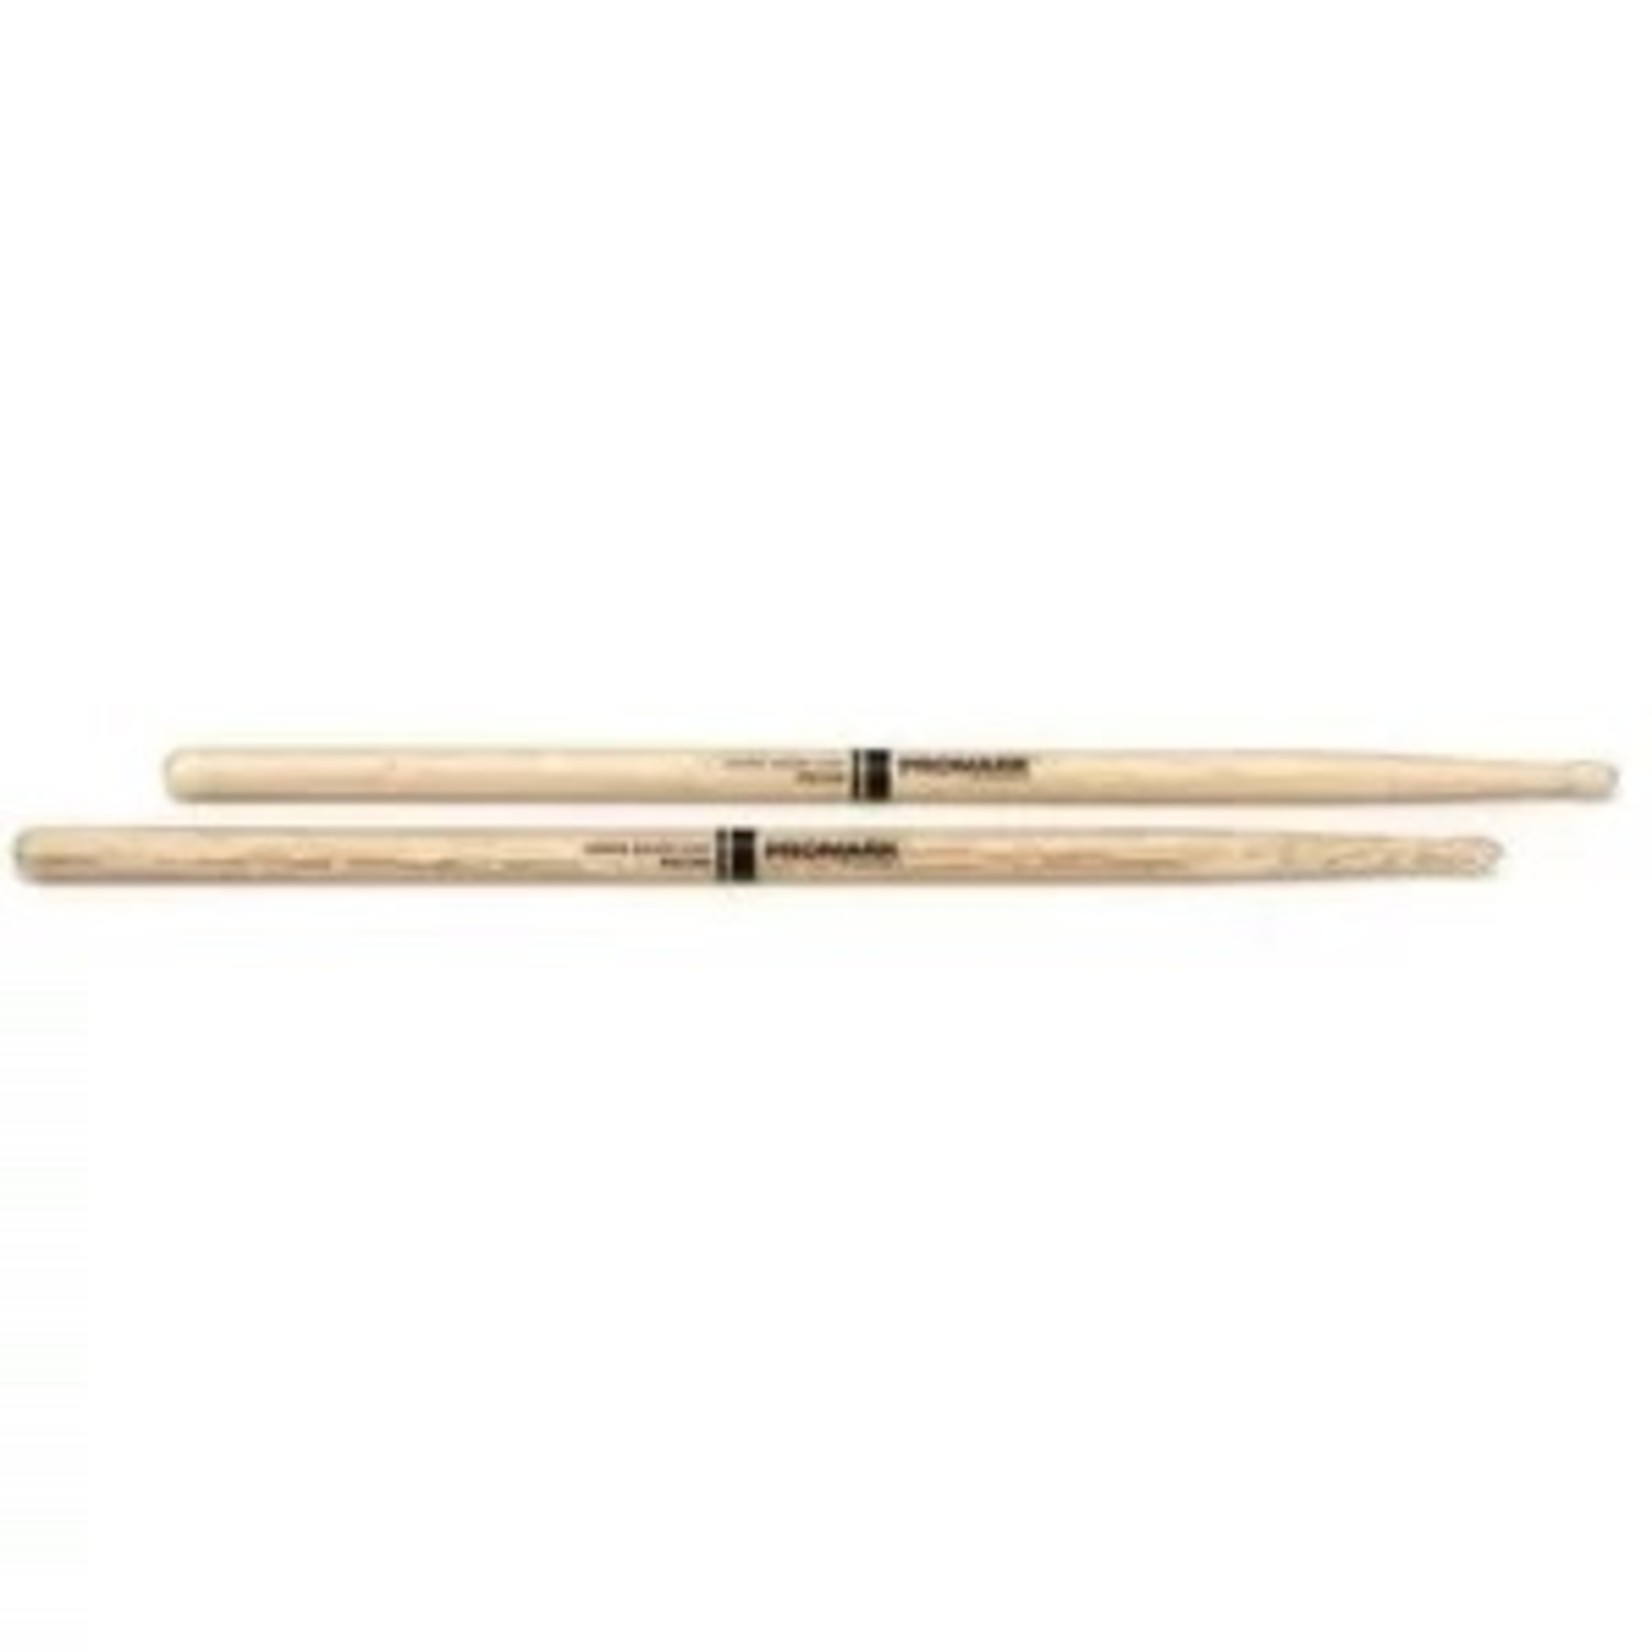 Promark ProMark Classic Shira Kashi Oak Attack 747B Wood Tip Drumstick